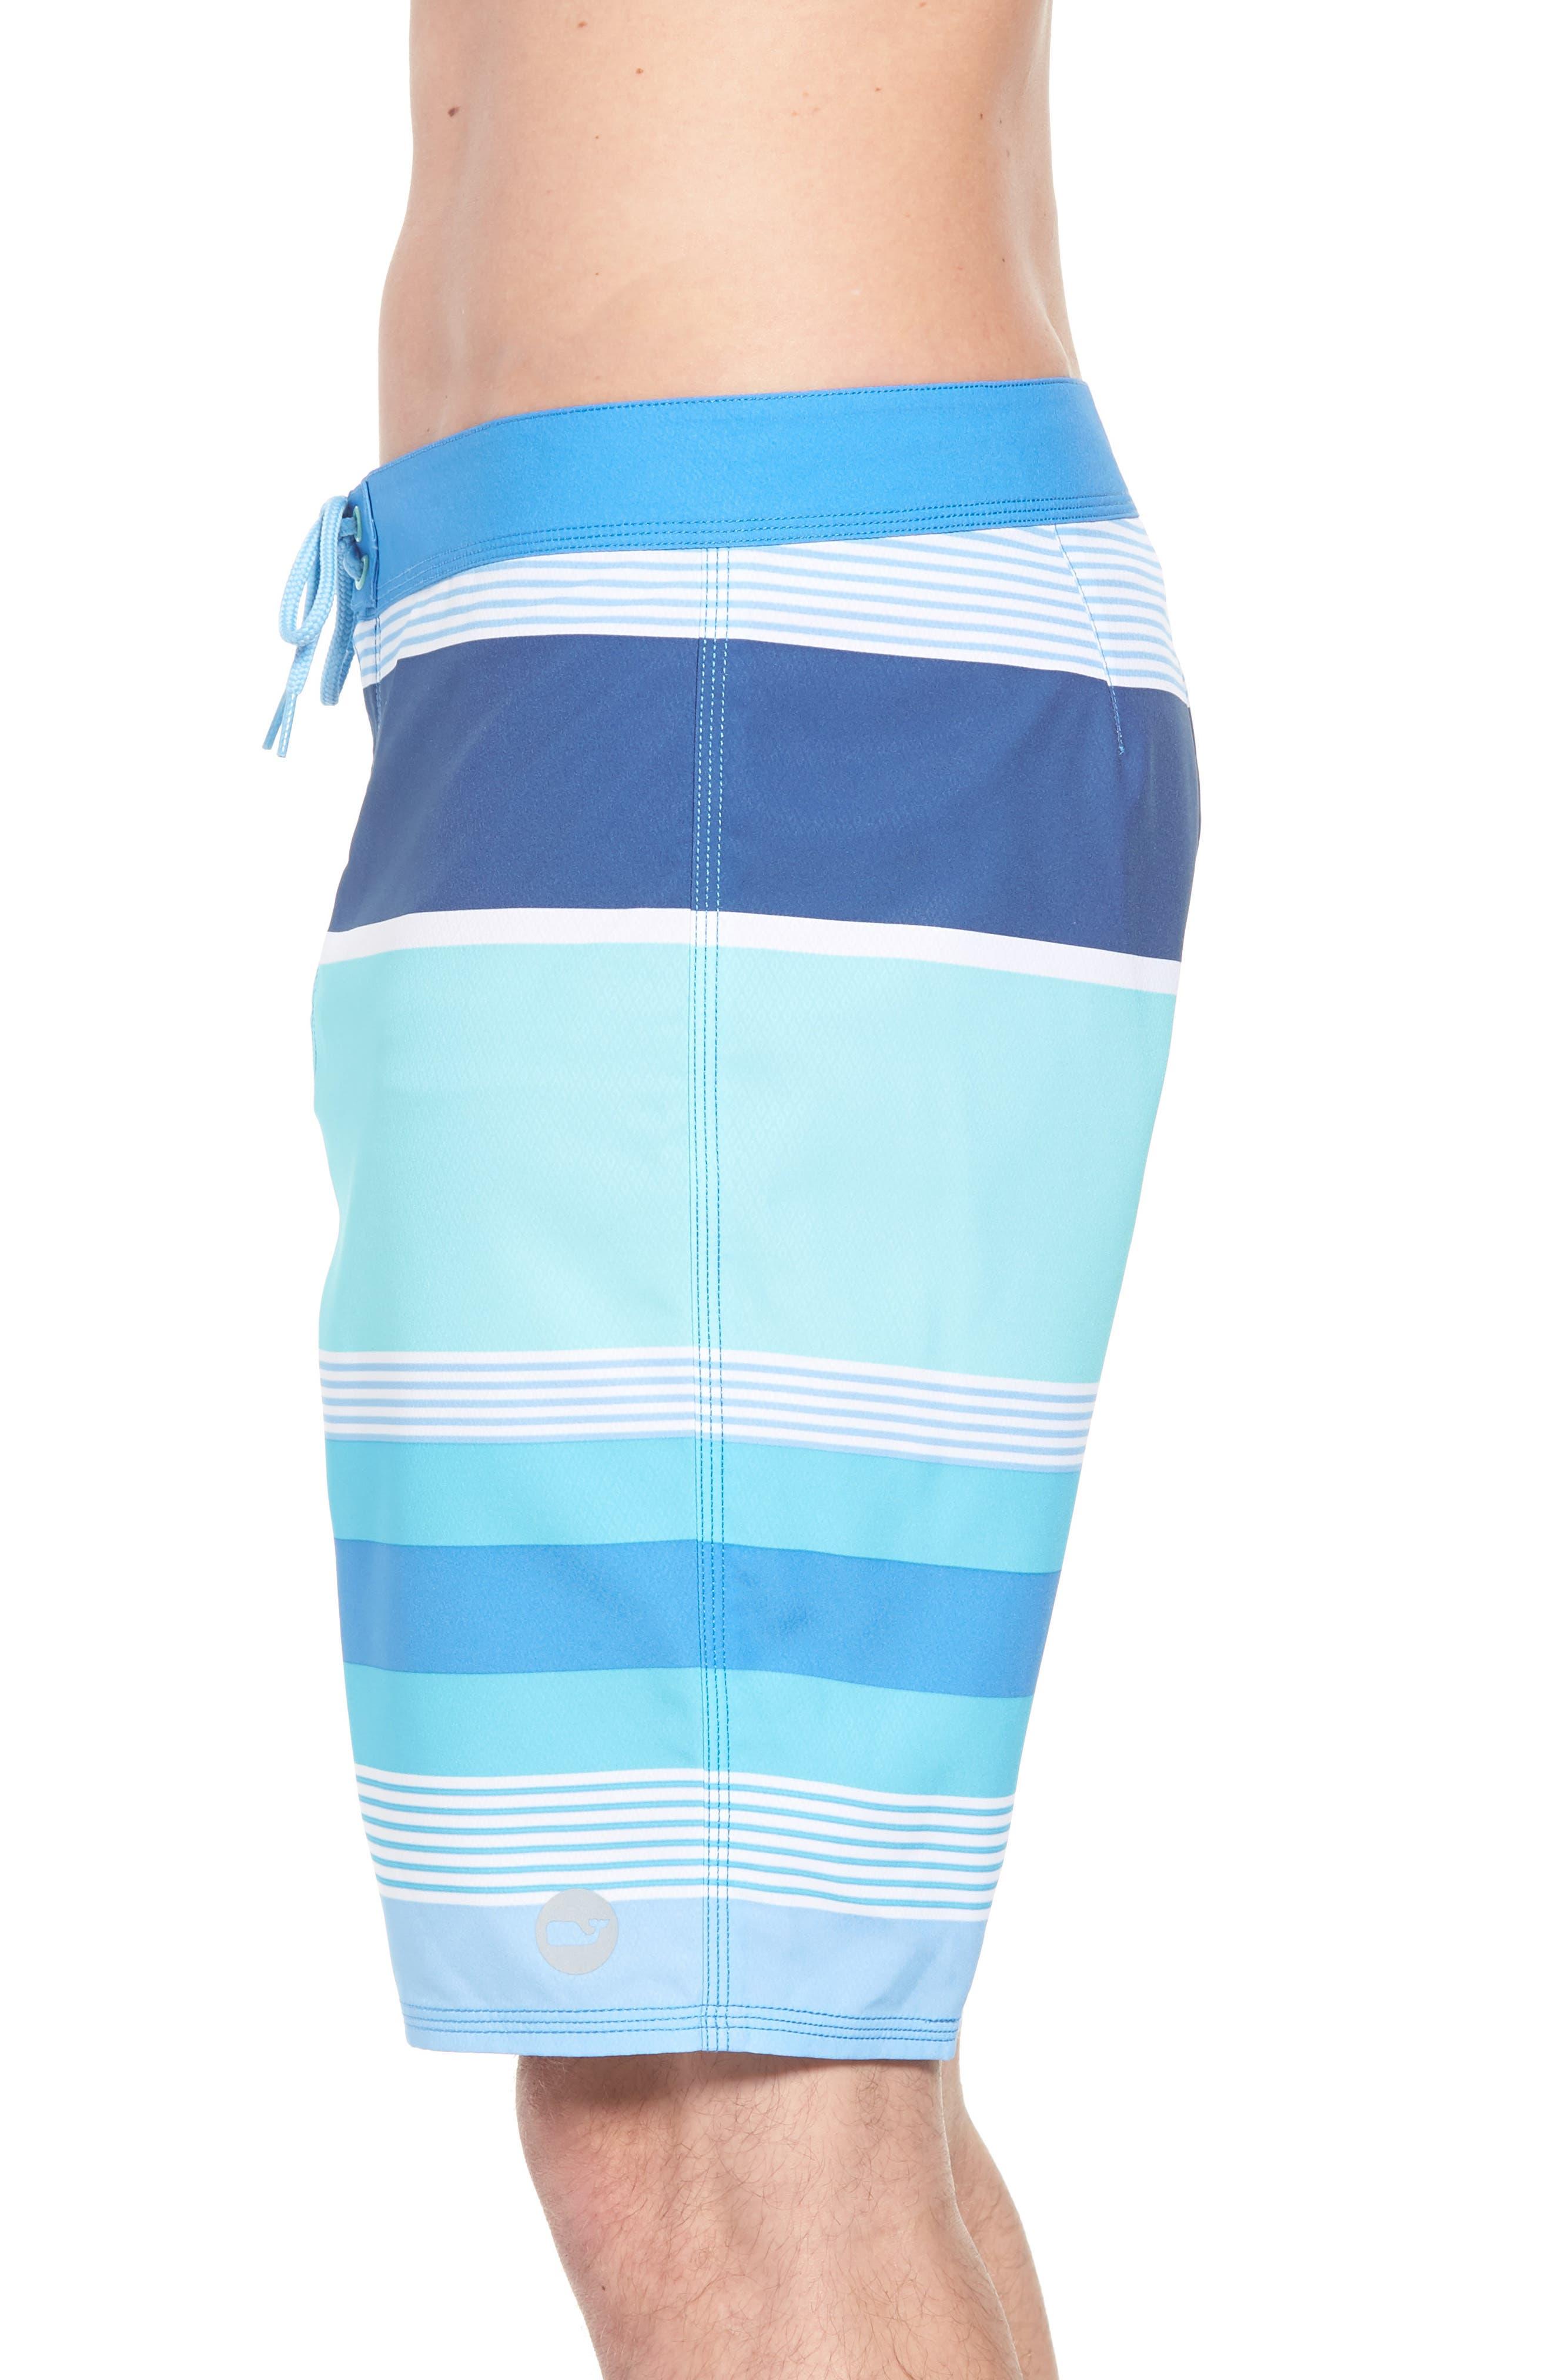 Peaks Island Board Shorts,                             Alternate thumbnail 3, color,                             437